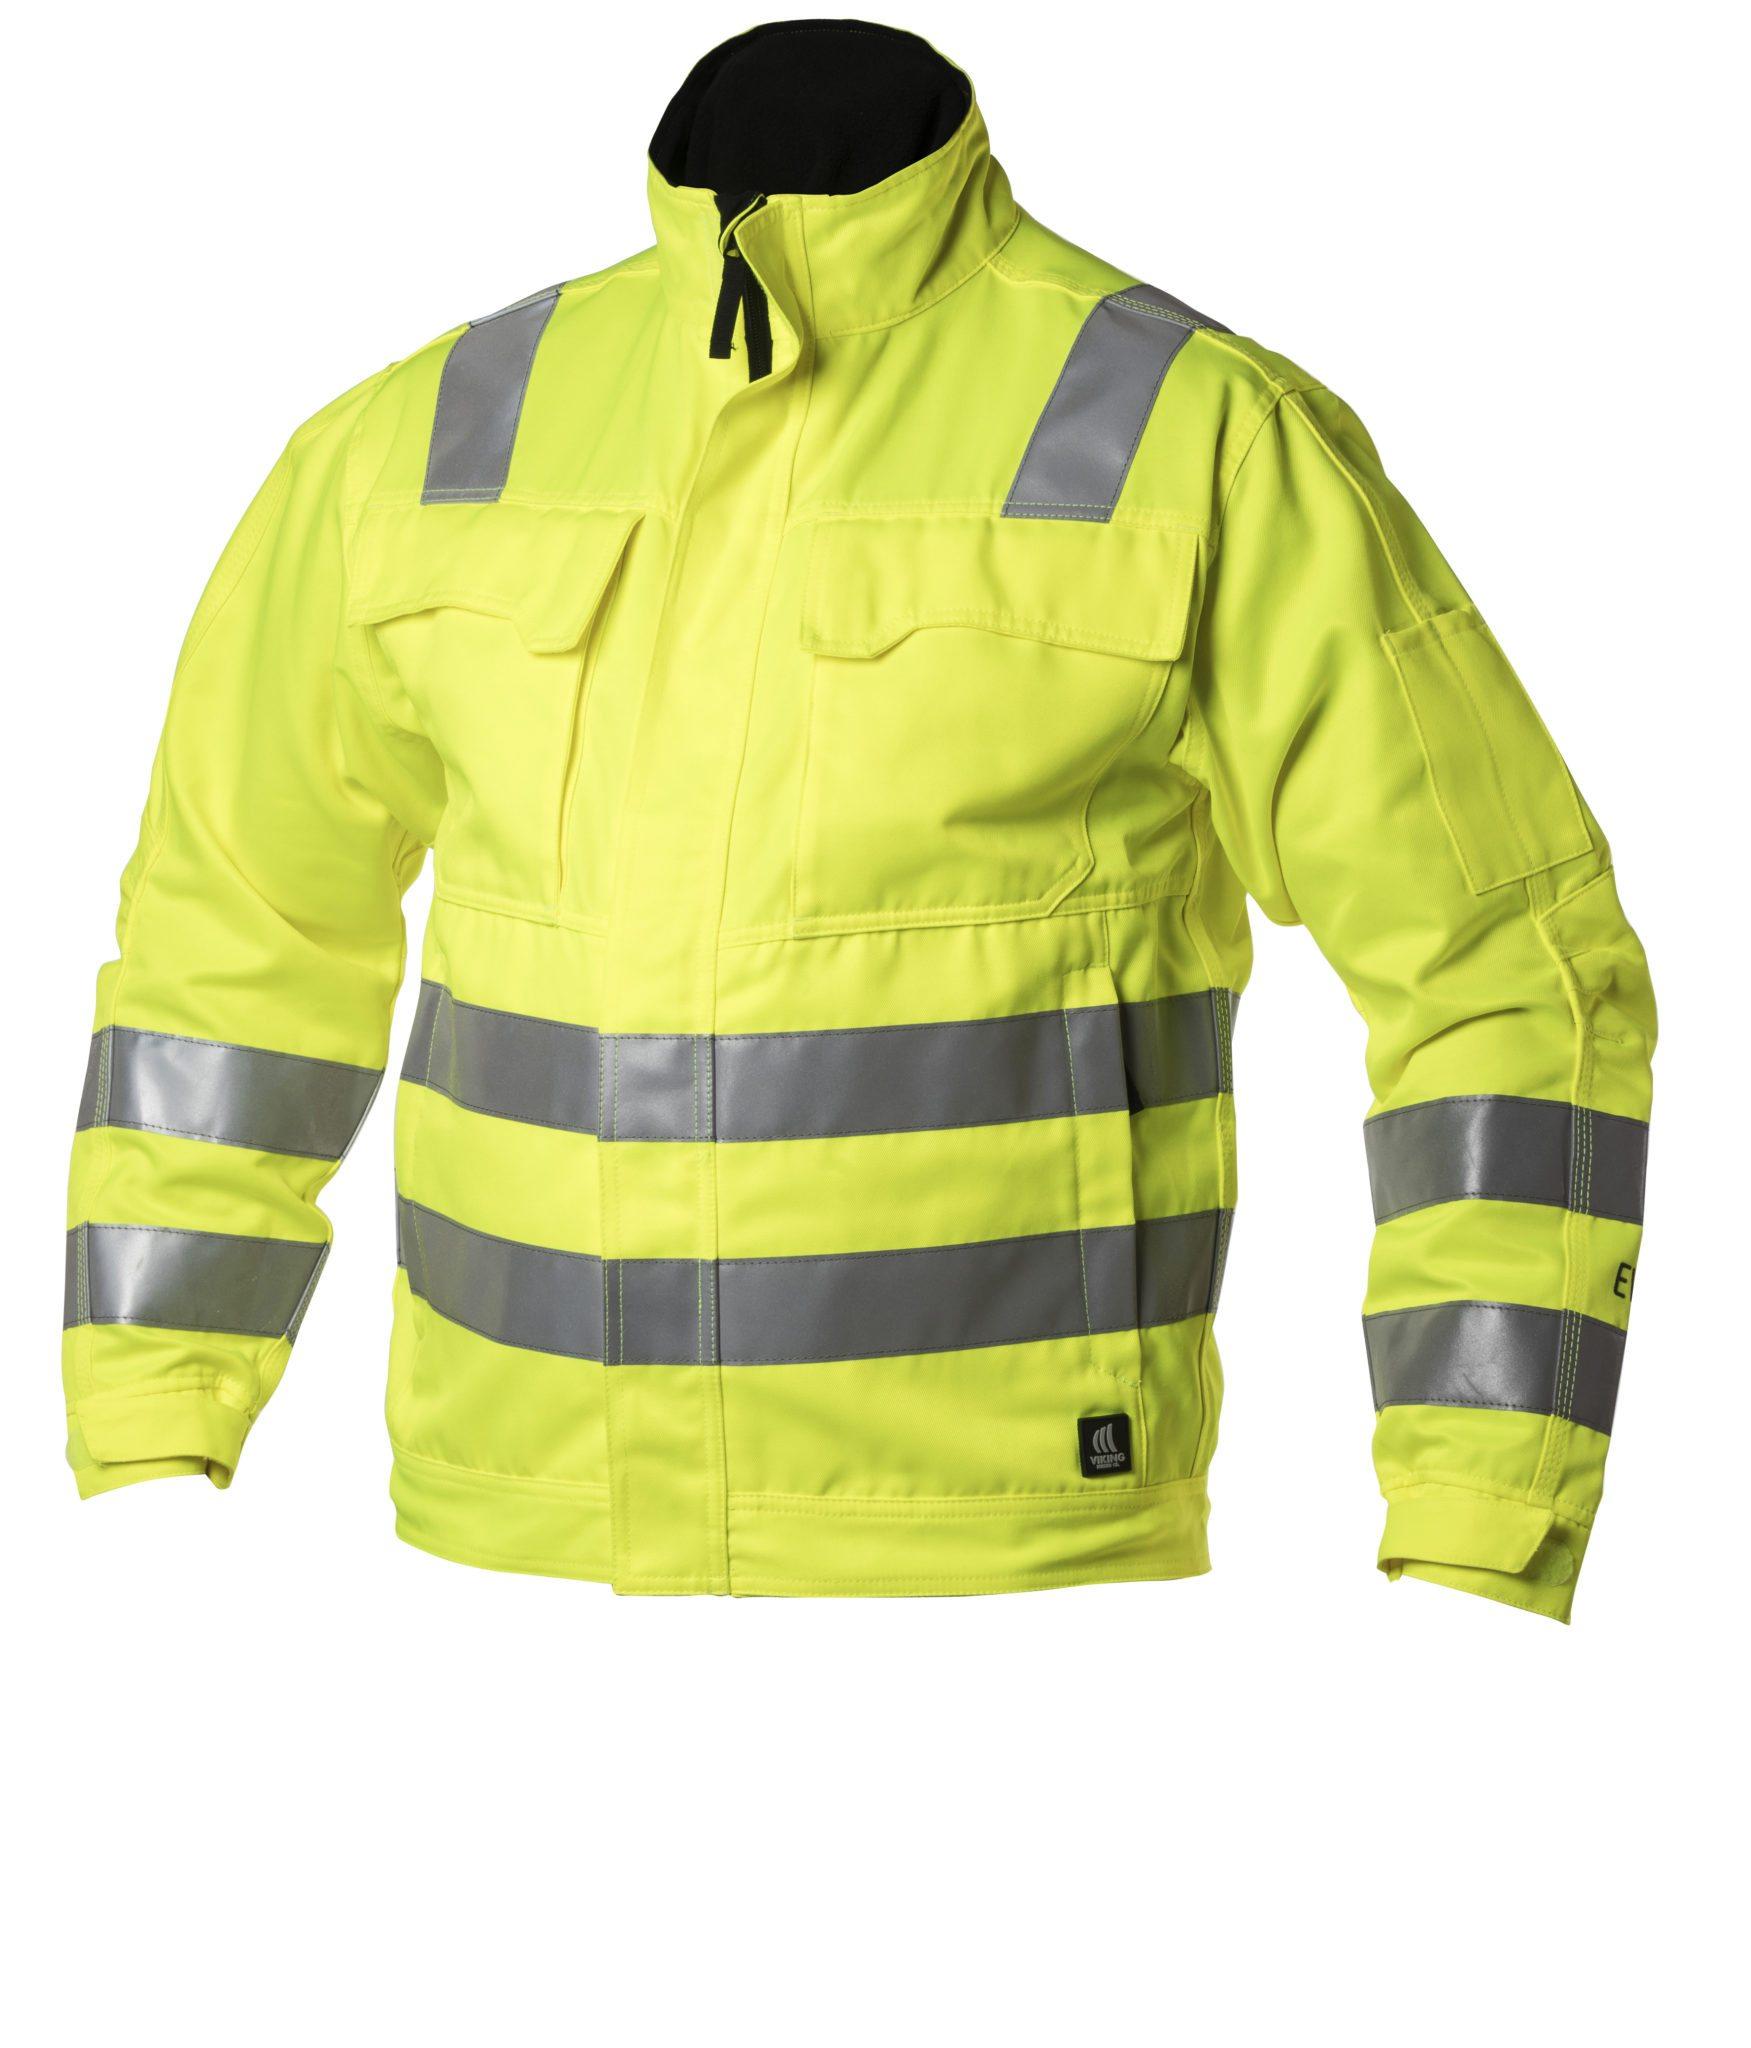 Work jacket EVOLITE